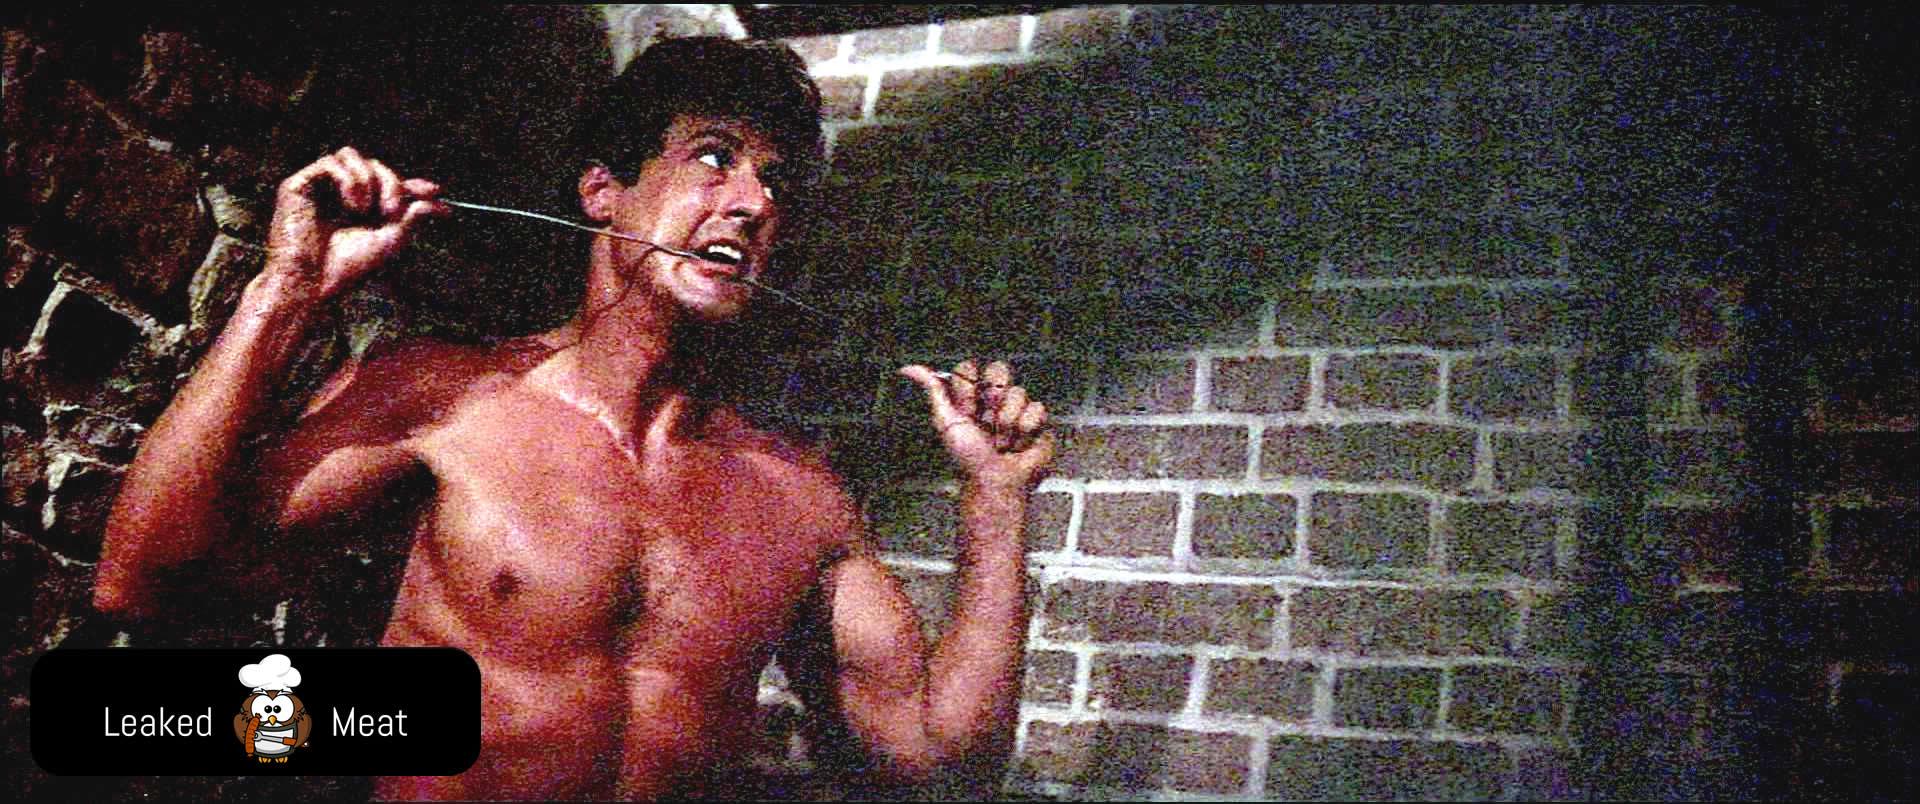 Sylvester Stallone | LeakedMeat 38